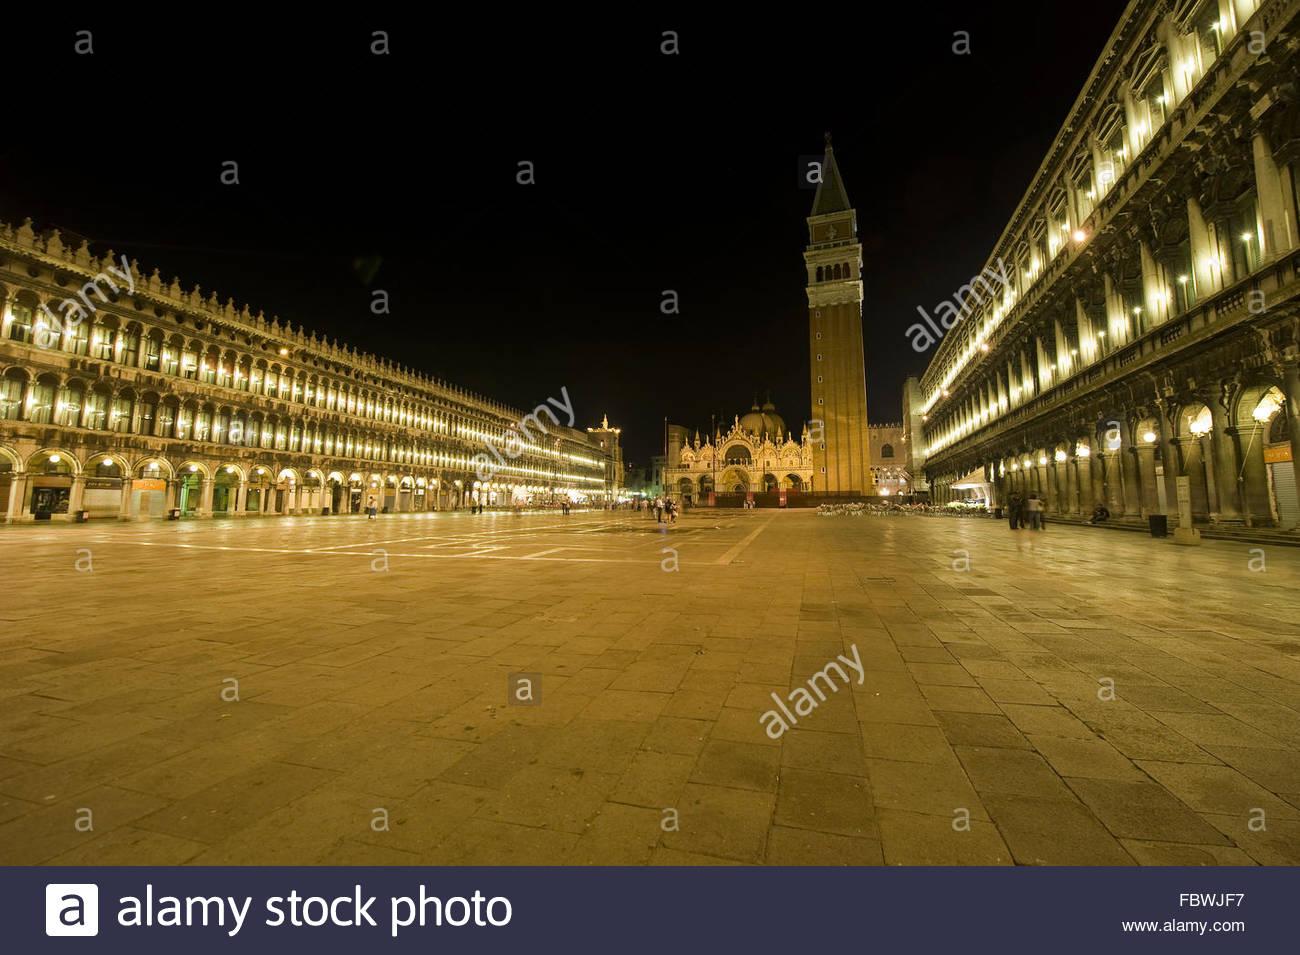 Venedig: Markusplatz bei Nacht - Stock Image